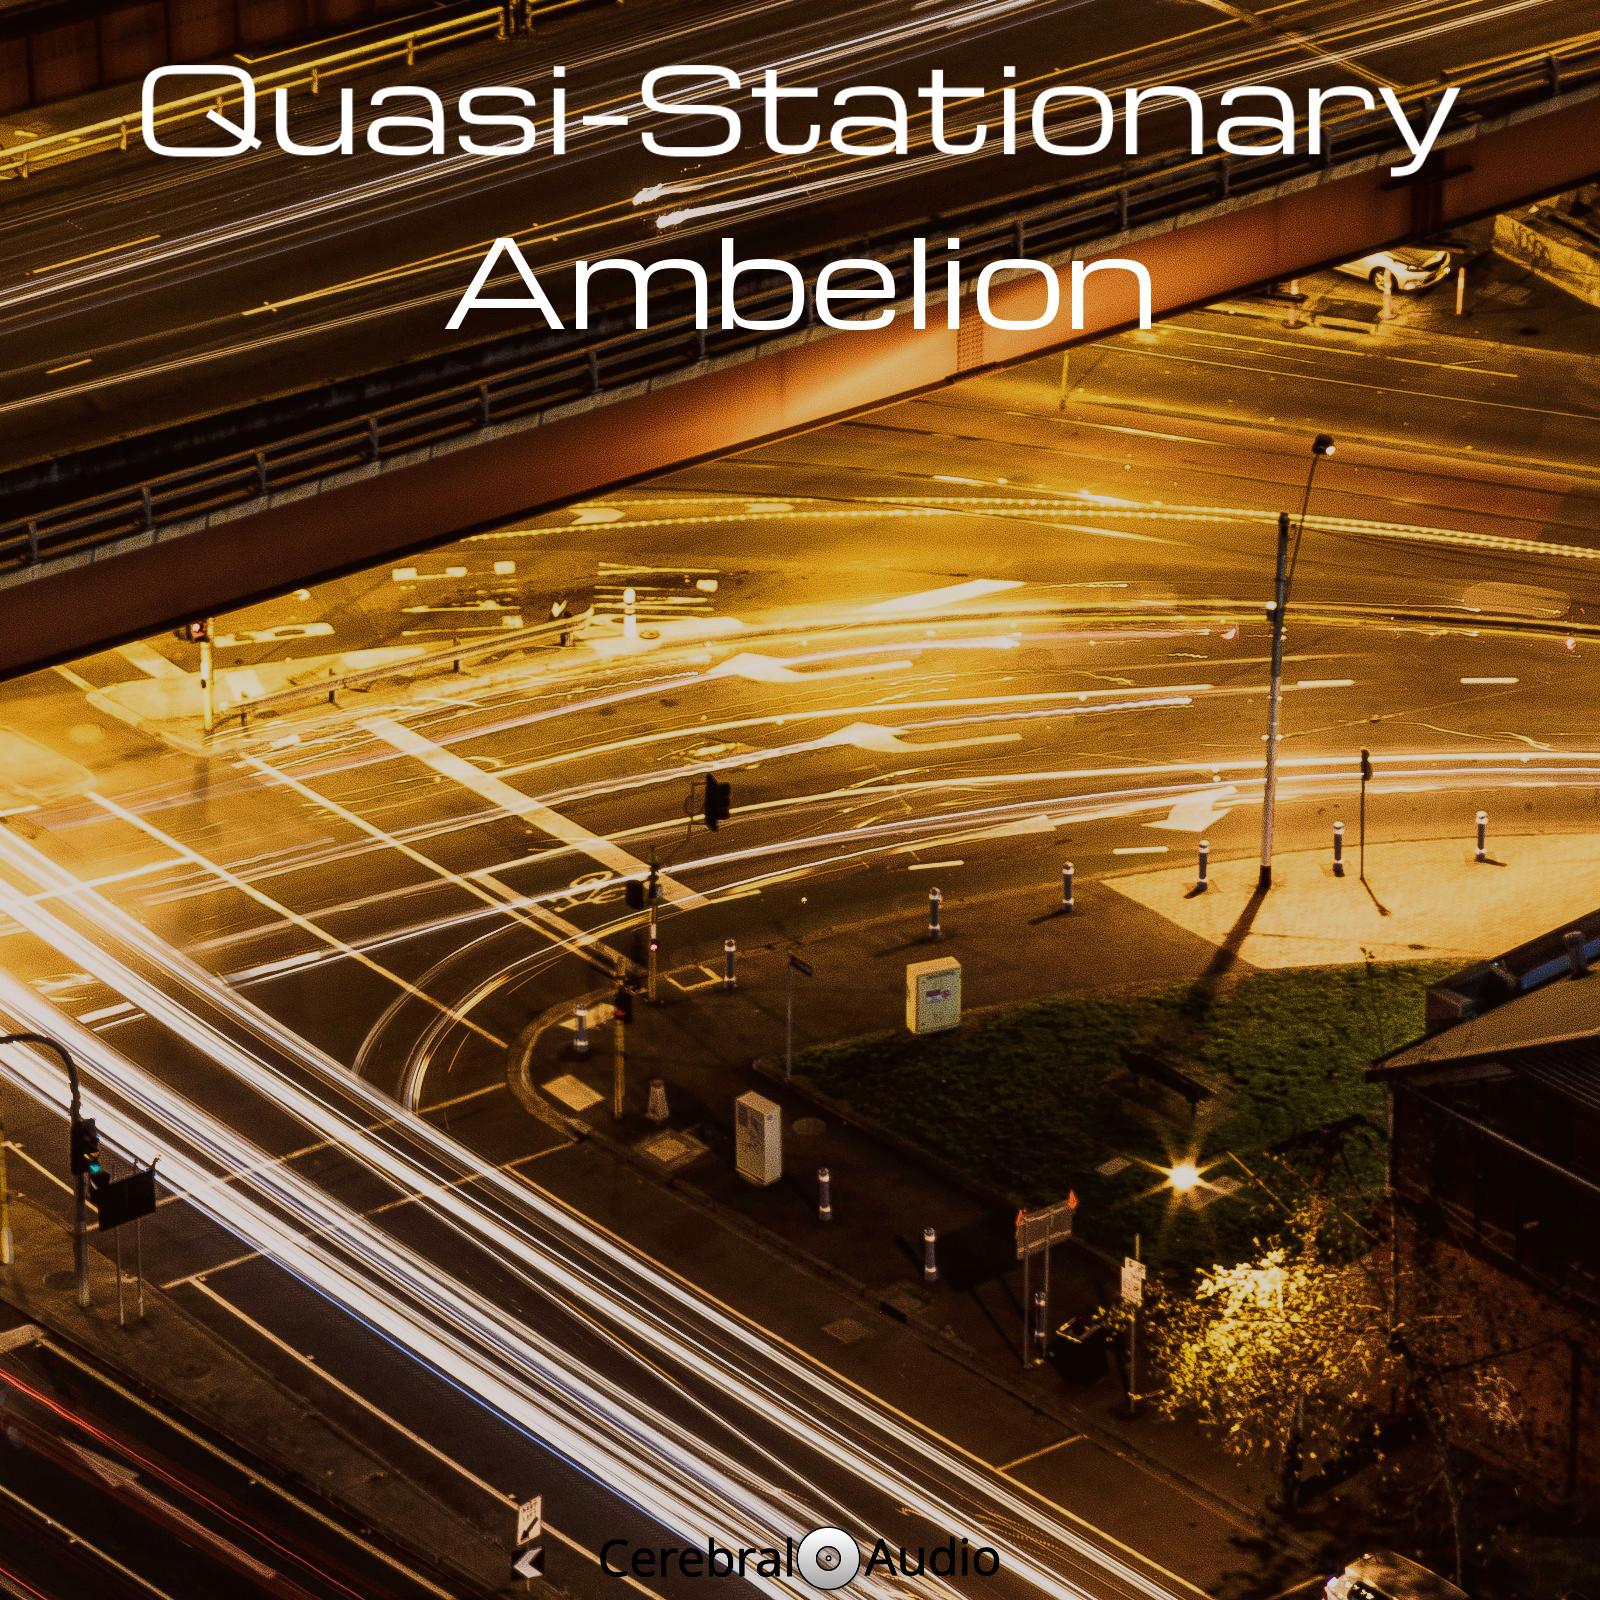 Quasi-Stationary